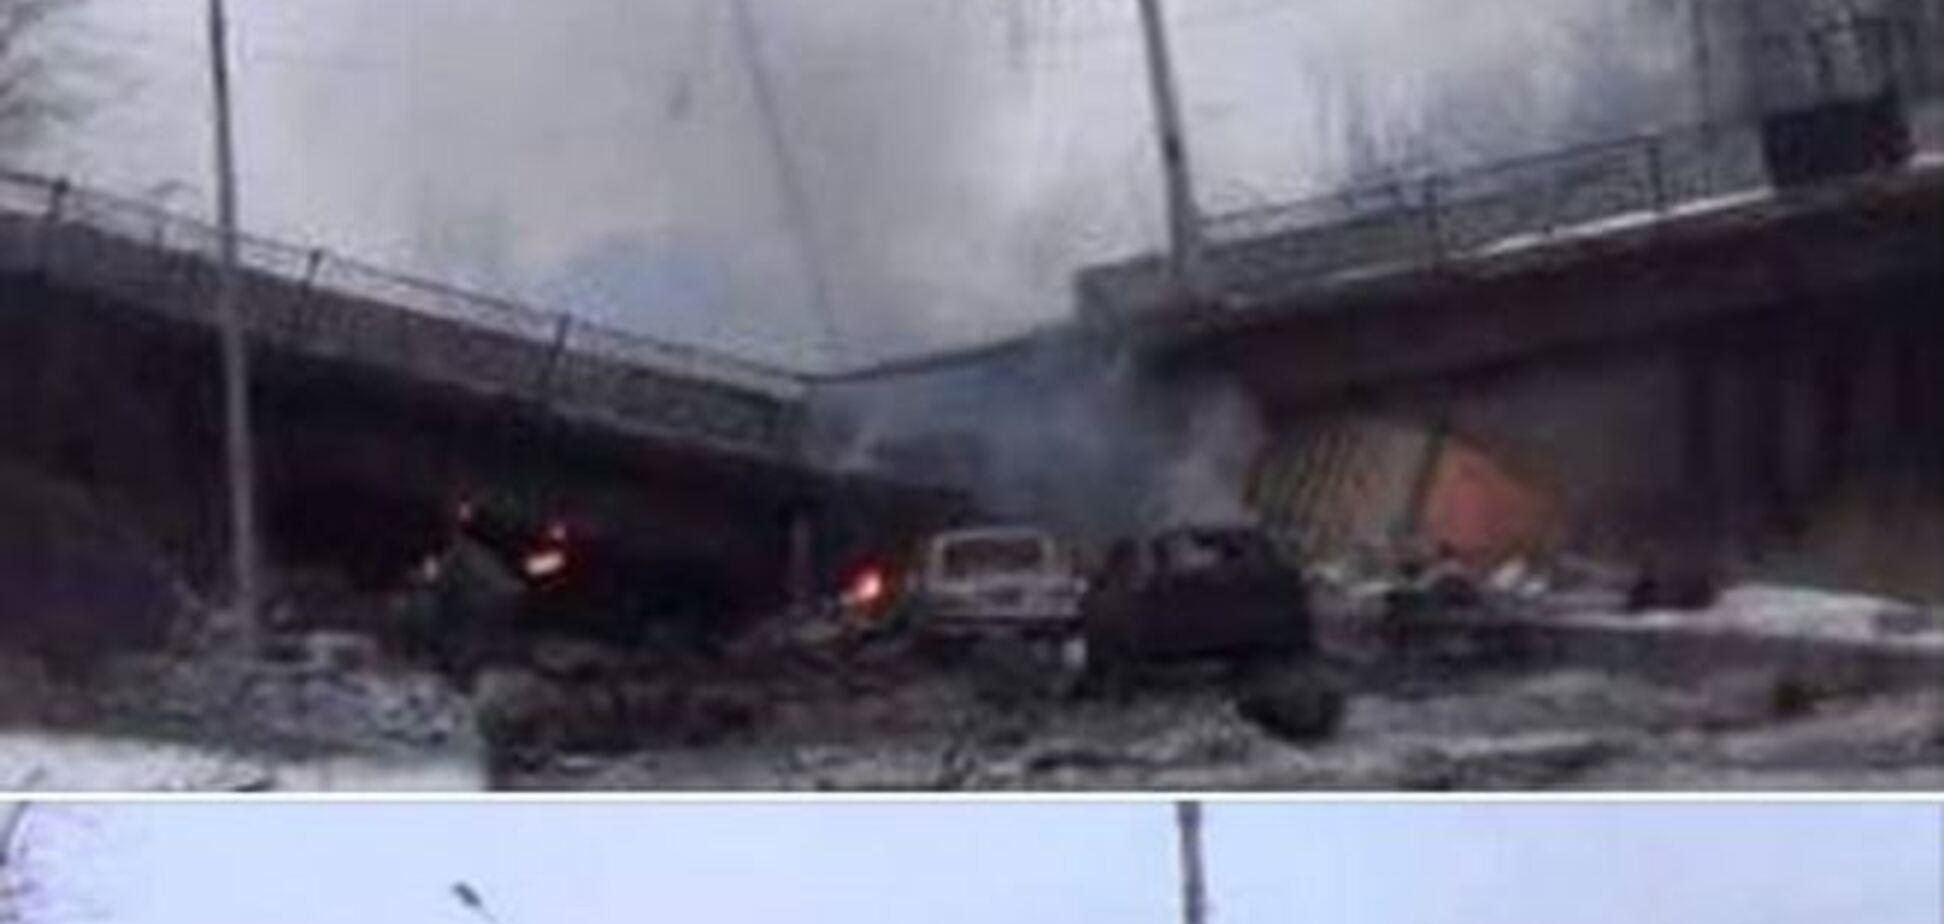 Бои за донецкий аэропорт продолжаются, взорван мост. Фото и видеофакт